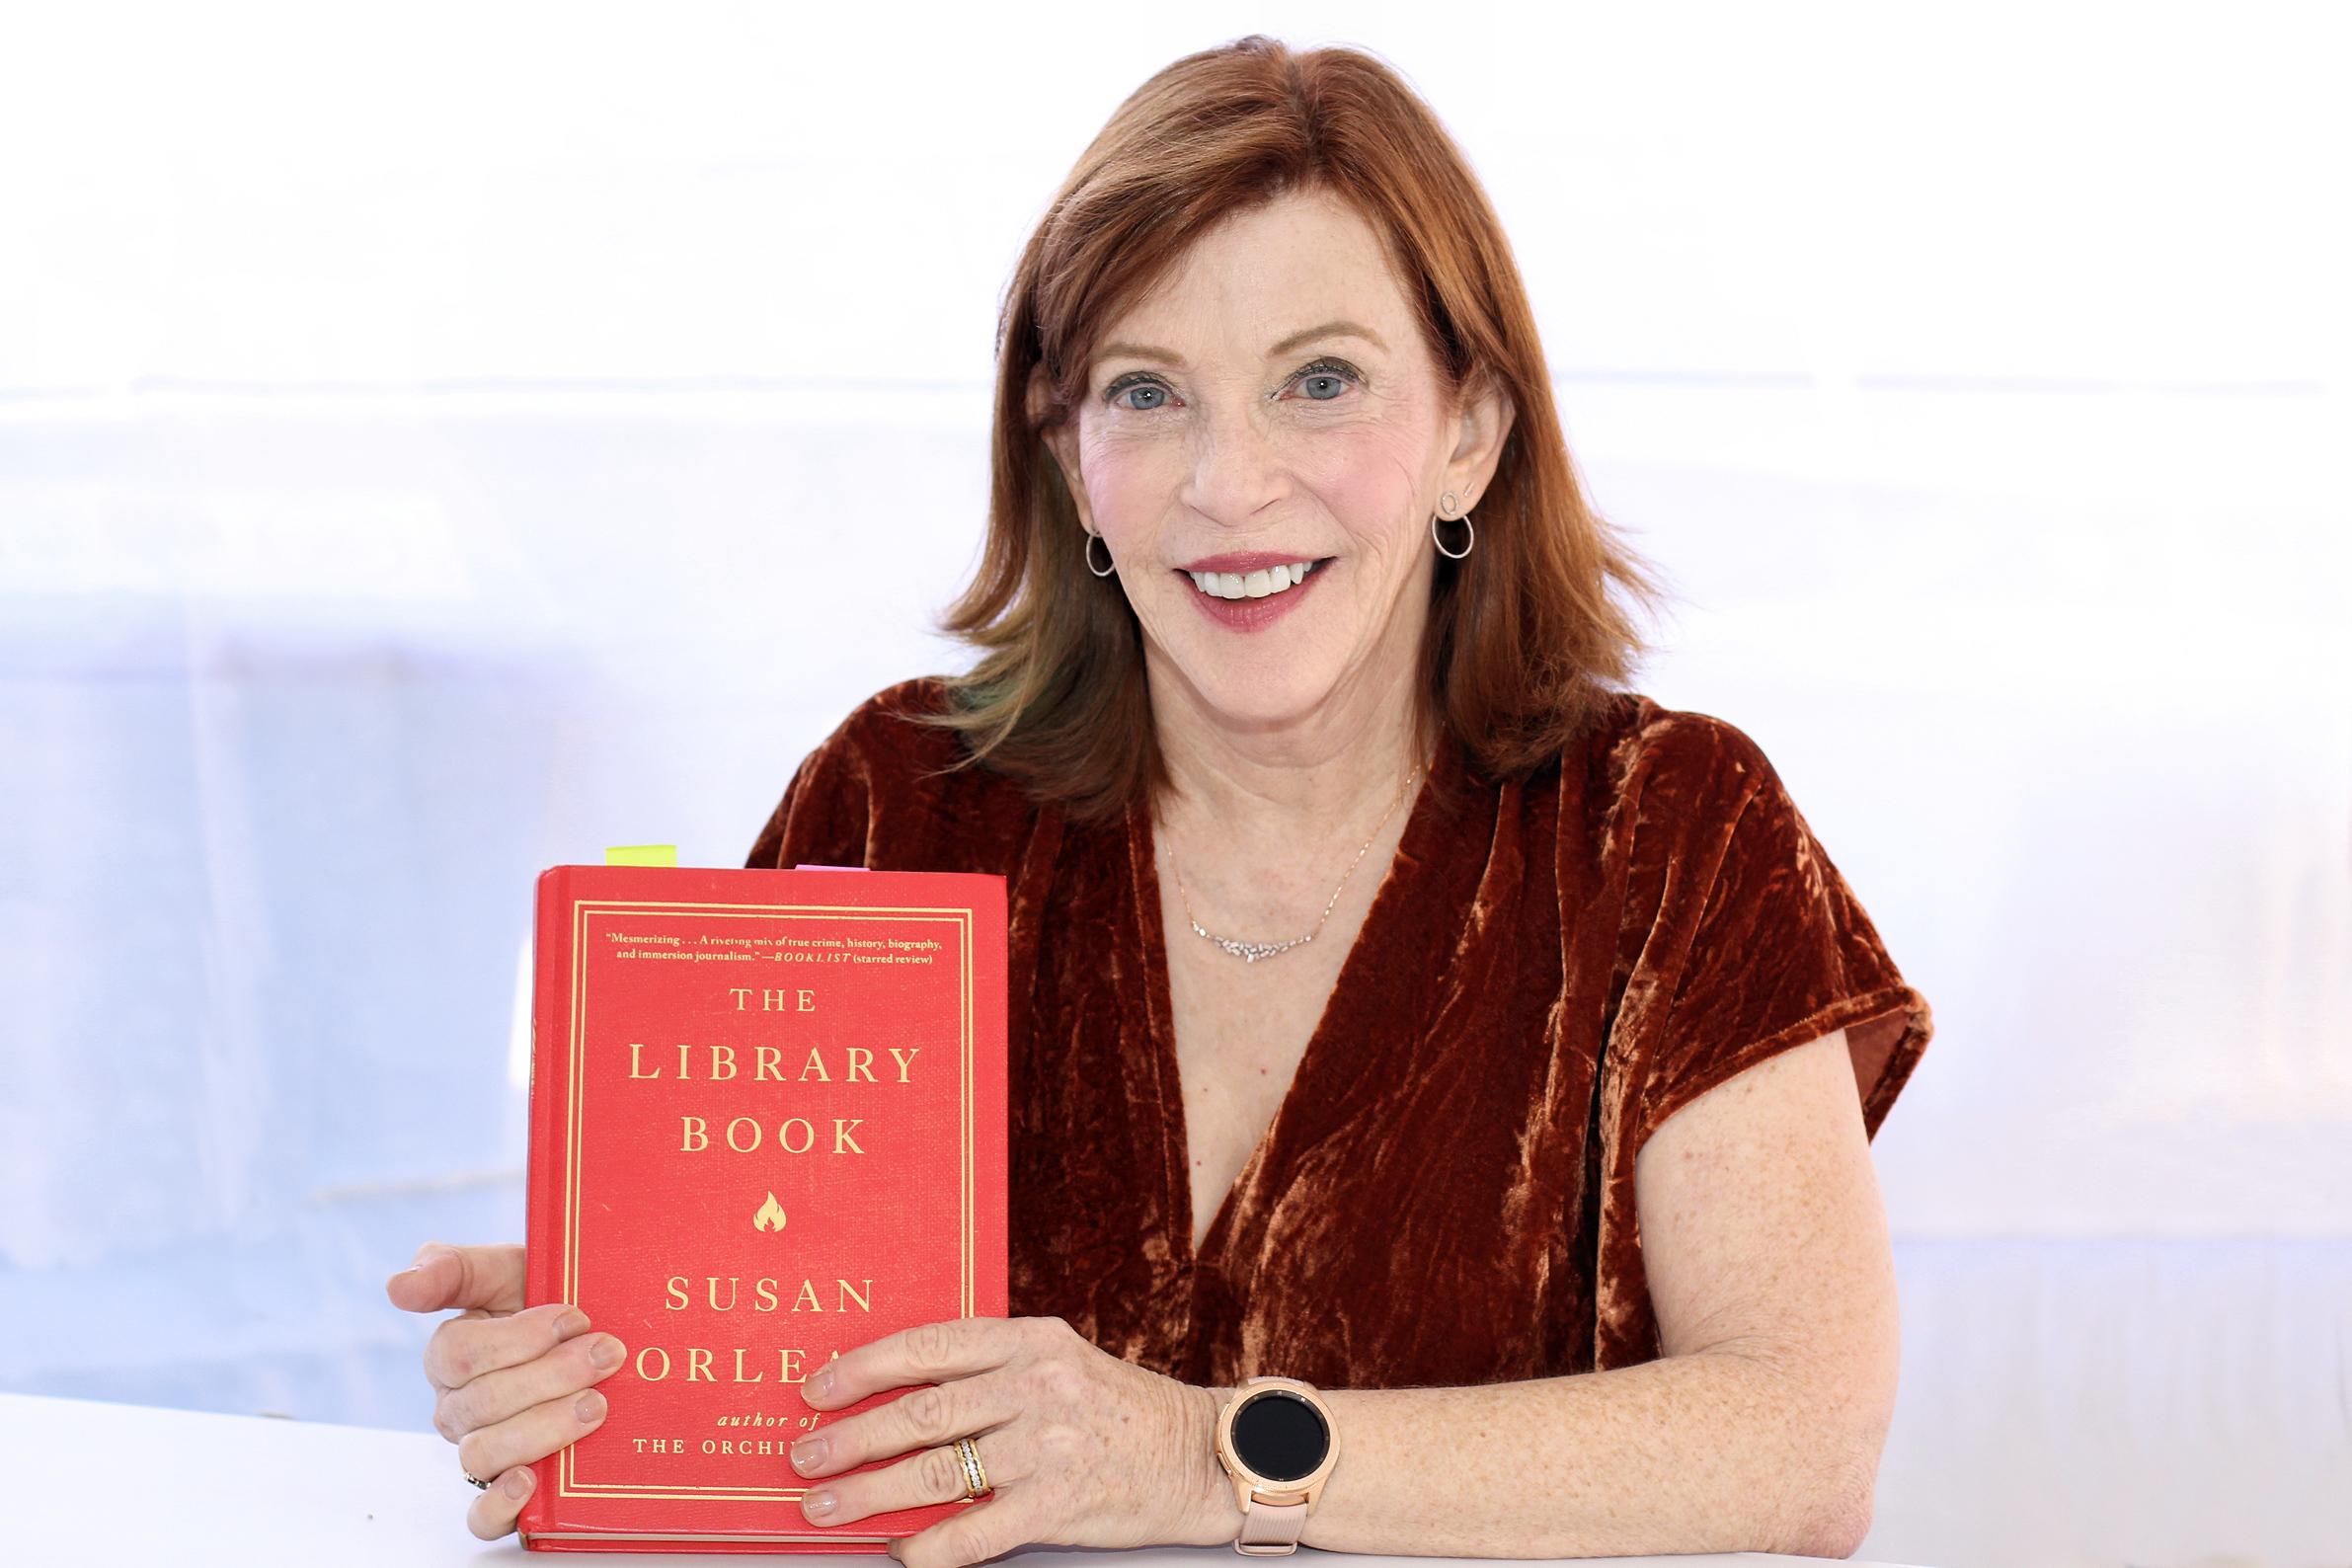 Orlean at the 2018 Texas Book Festival.